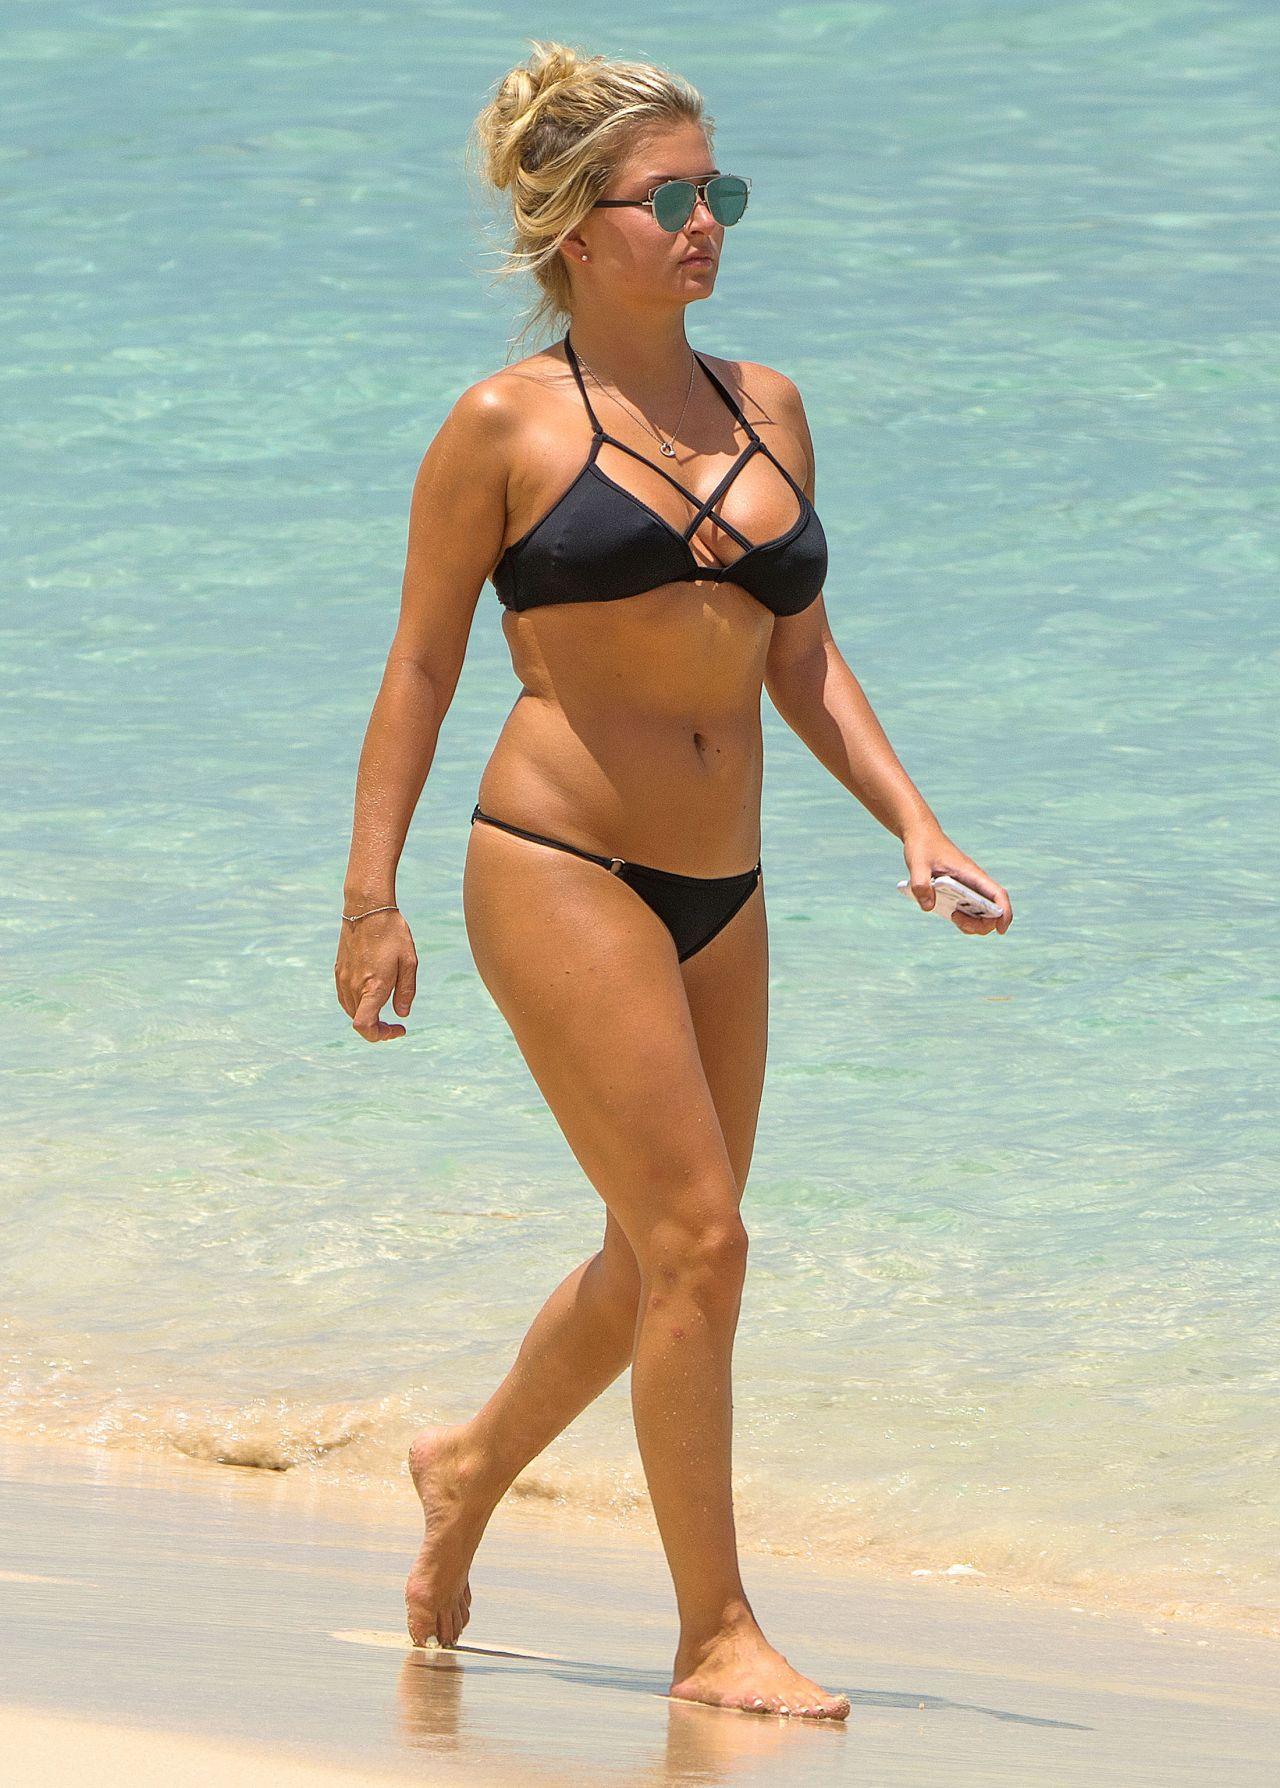 Zara Holland Hot In Bikini - Beach In Barbados 882016-2266